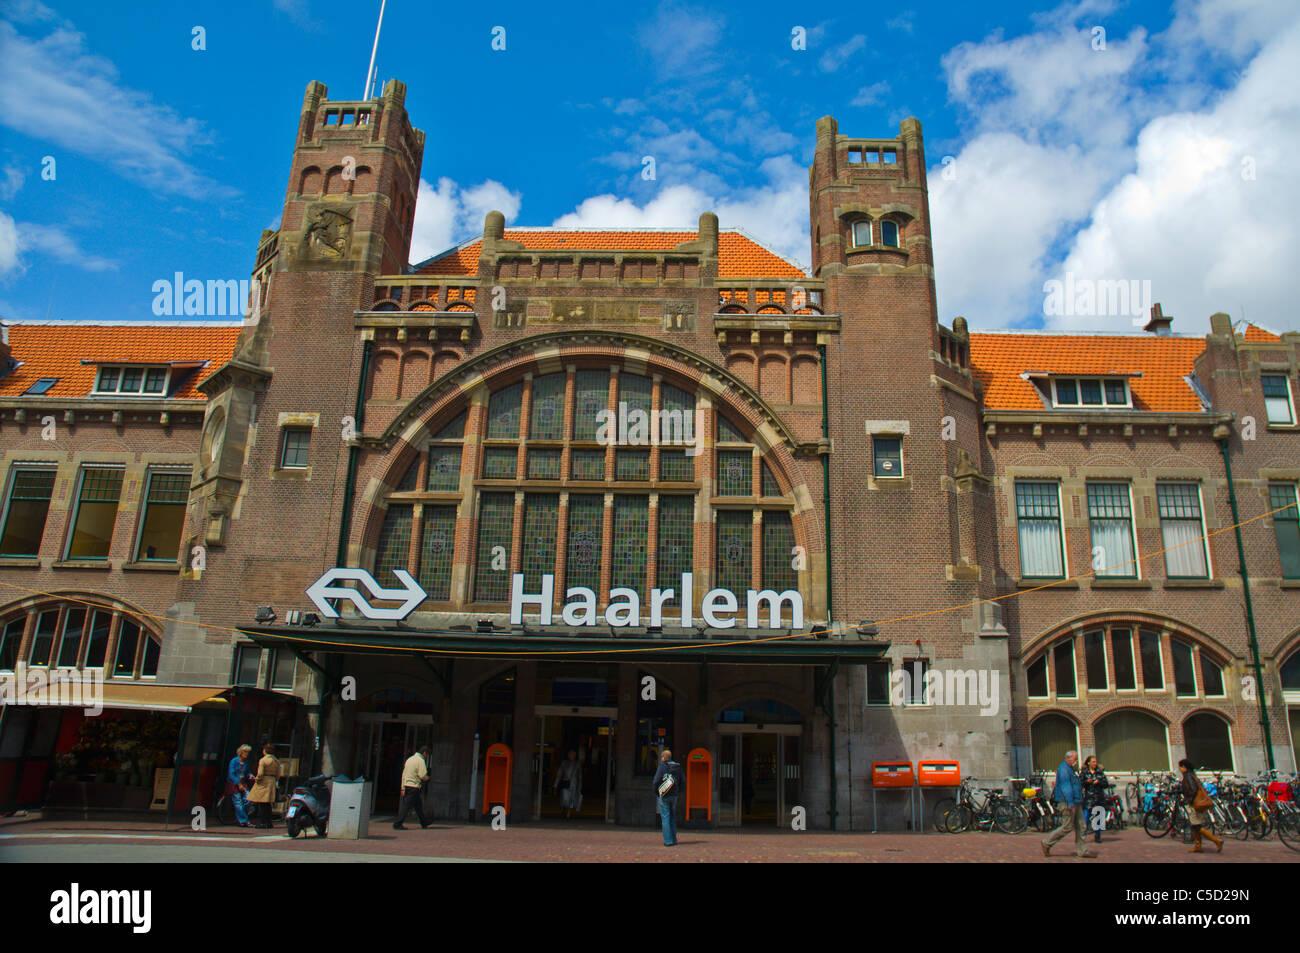 Haarlem centraal main railway station exterior Haarlem town the Stock Photo  - Alamy